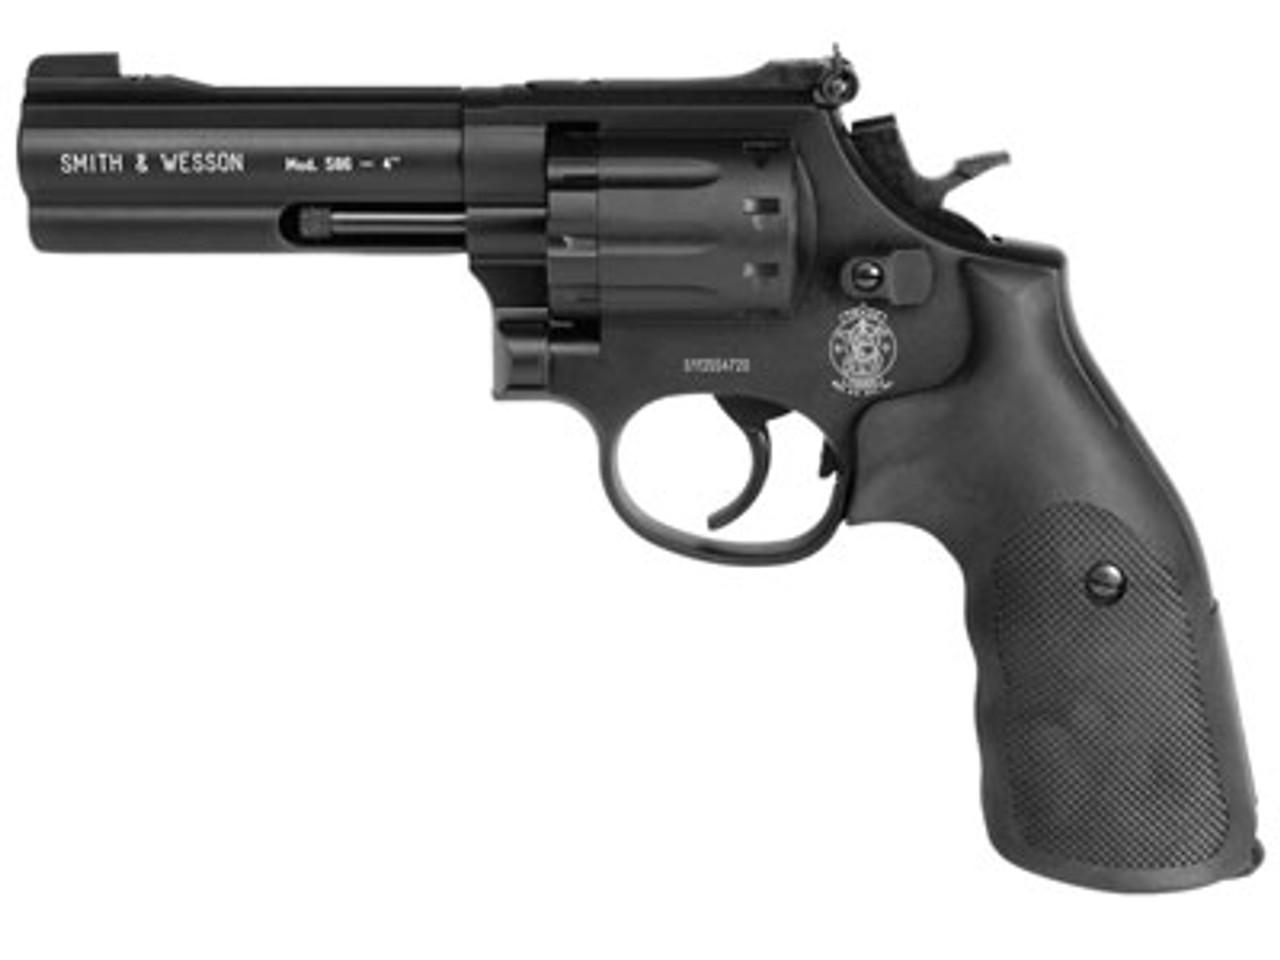 Smith & Wesson 586 4 Inch Barrel Airgun - Black